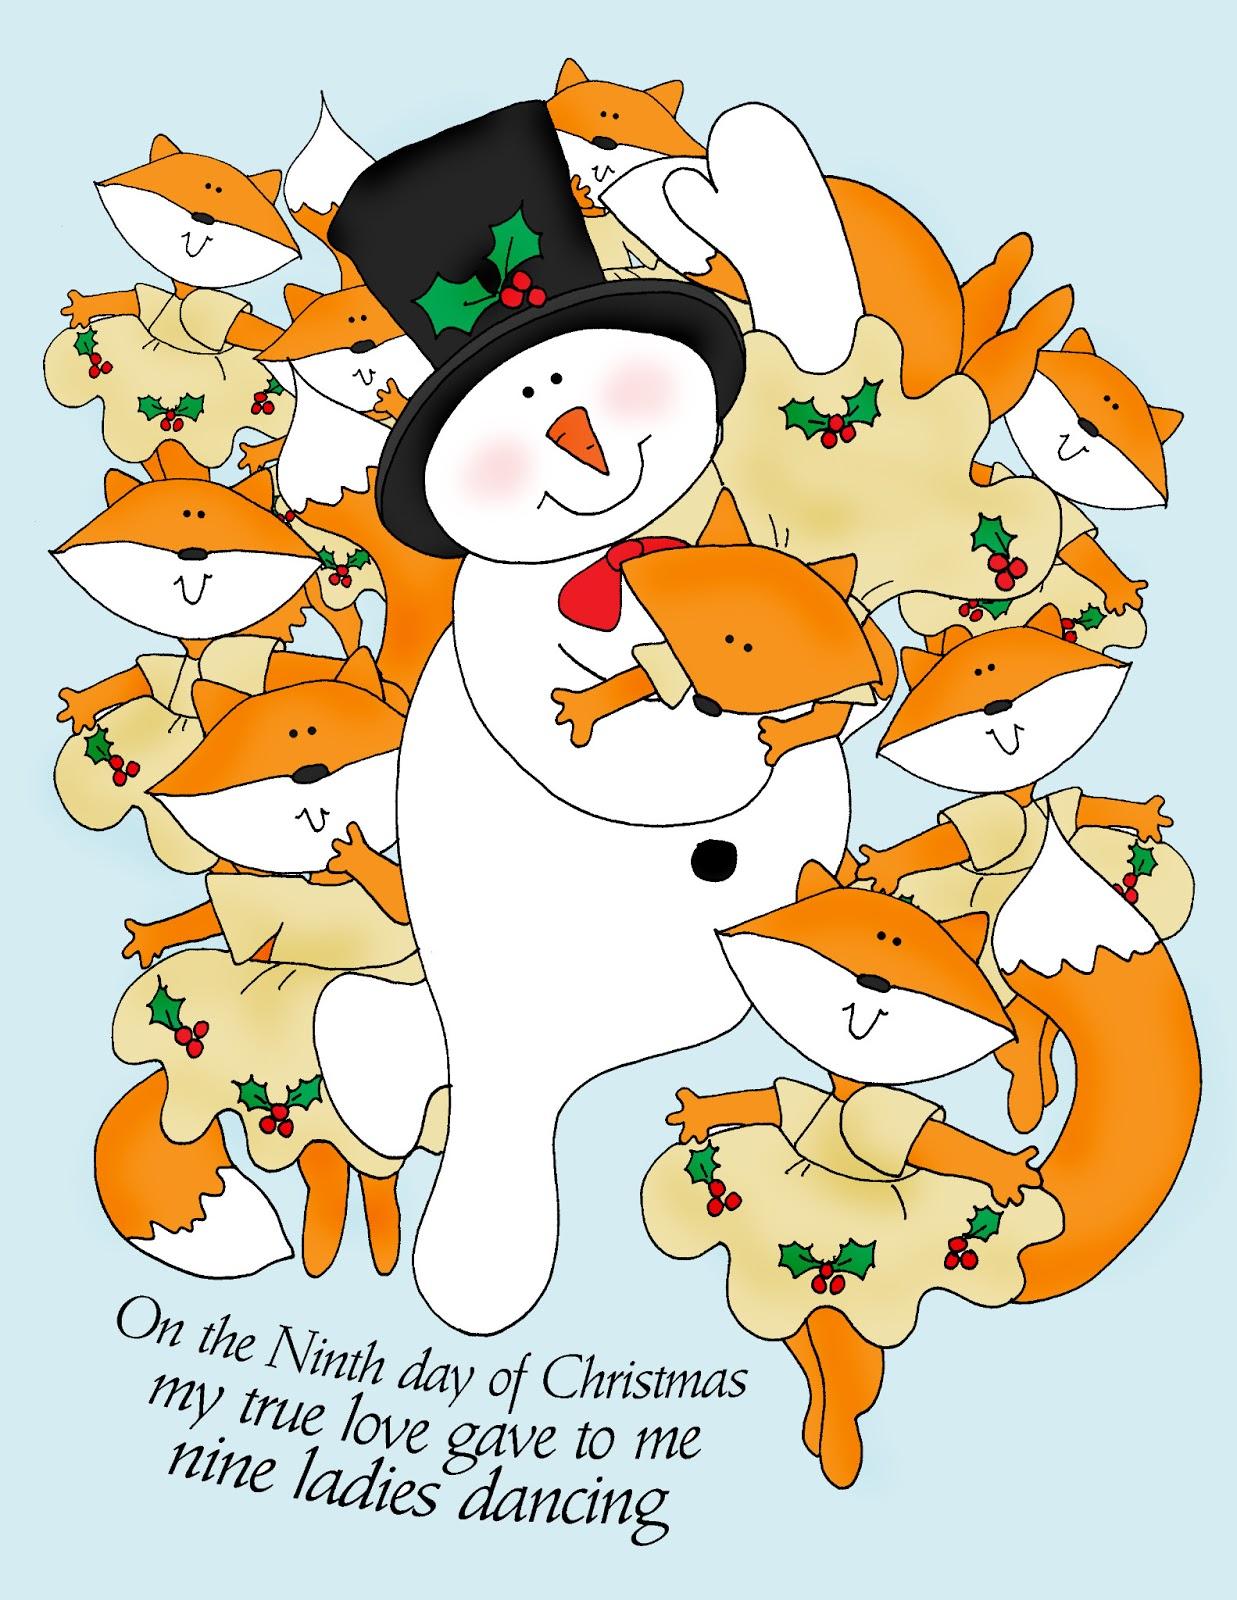 Ninth Day Of Christmas.Free Dearie Dolls Digi Stamps On The Ninth Day Of Christmas